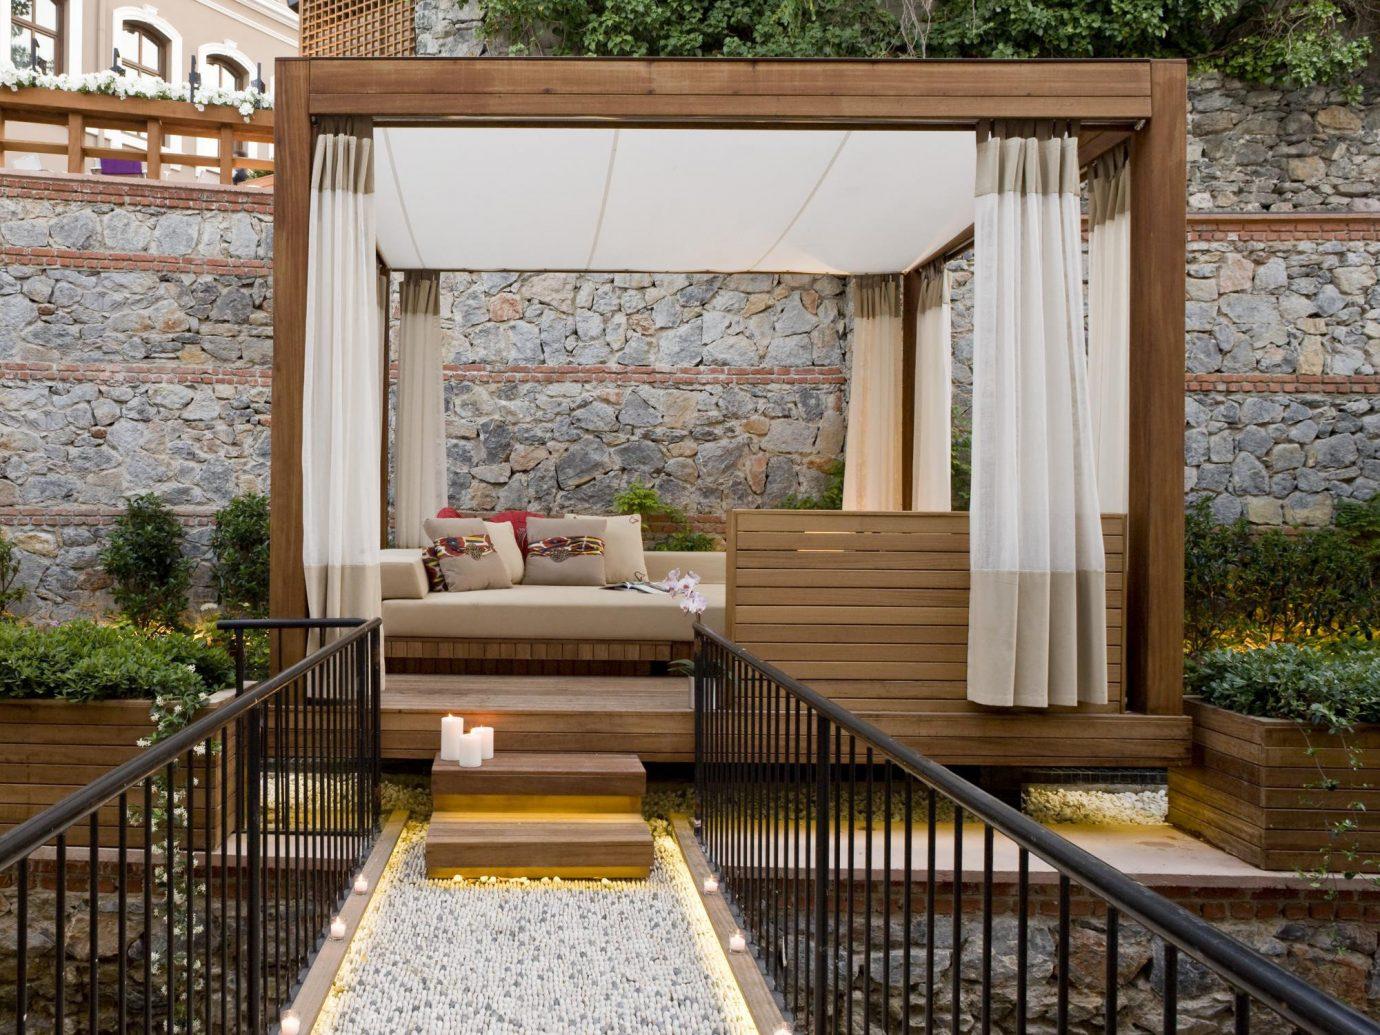 Hotels Luxury Travel building porch backyard outdoor structure estate home Courtyard Deck interior design wood cottage step furniture